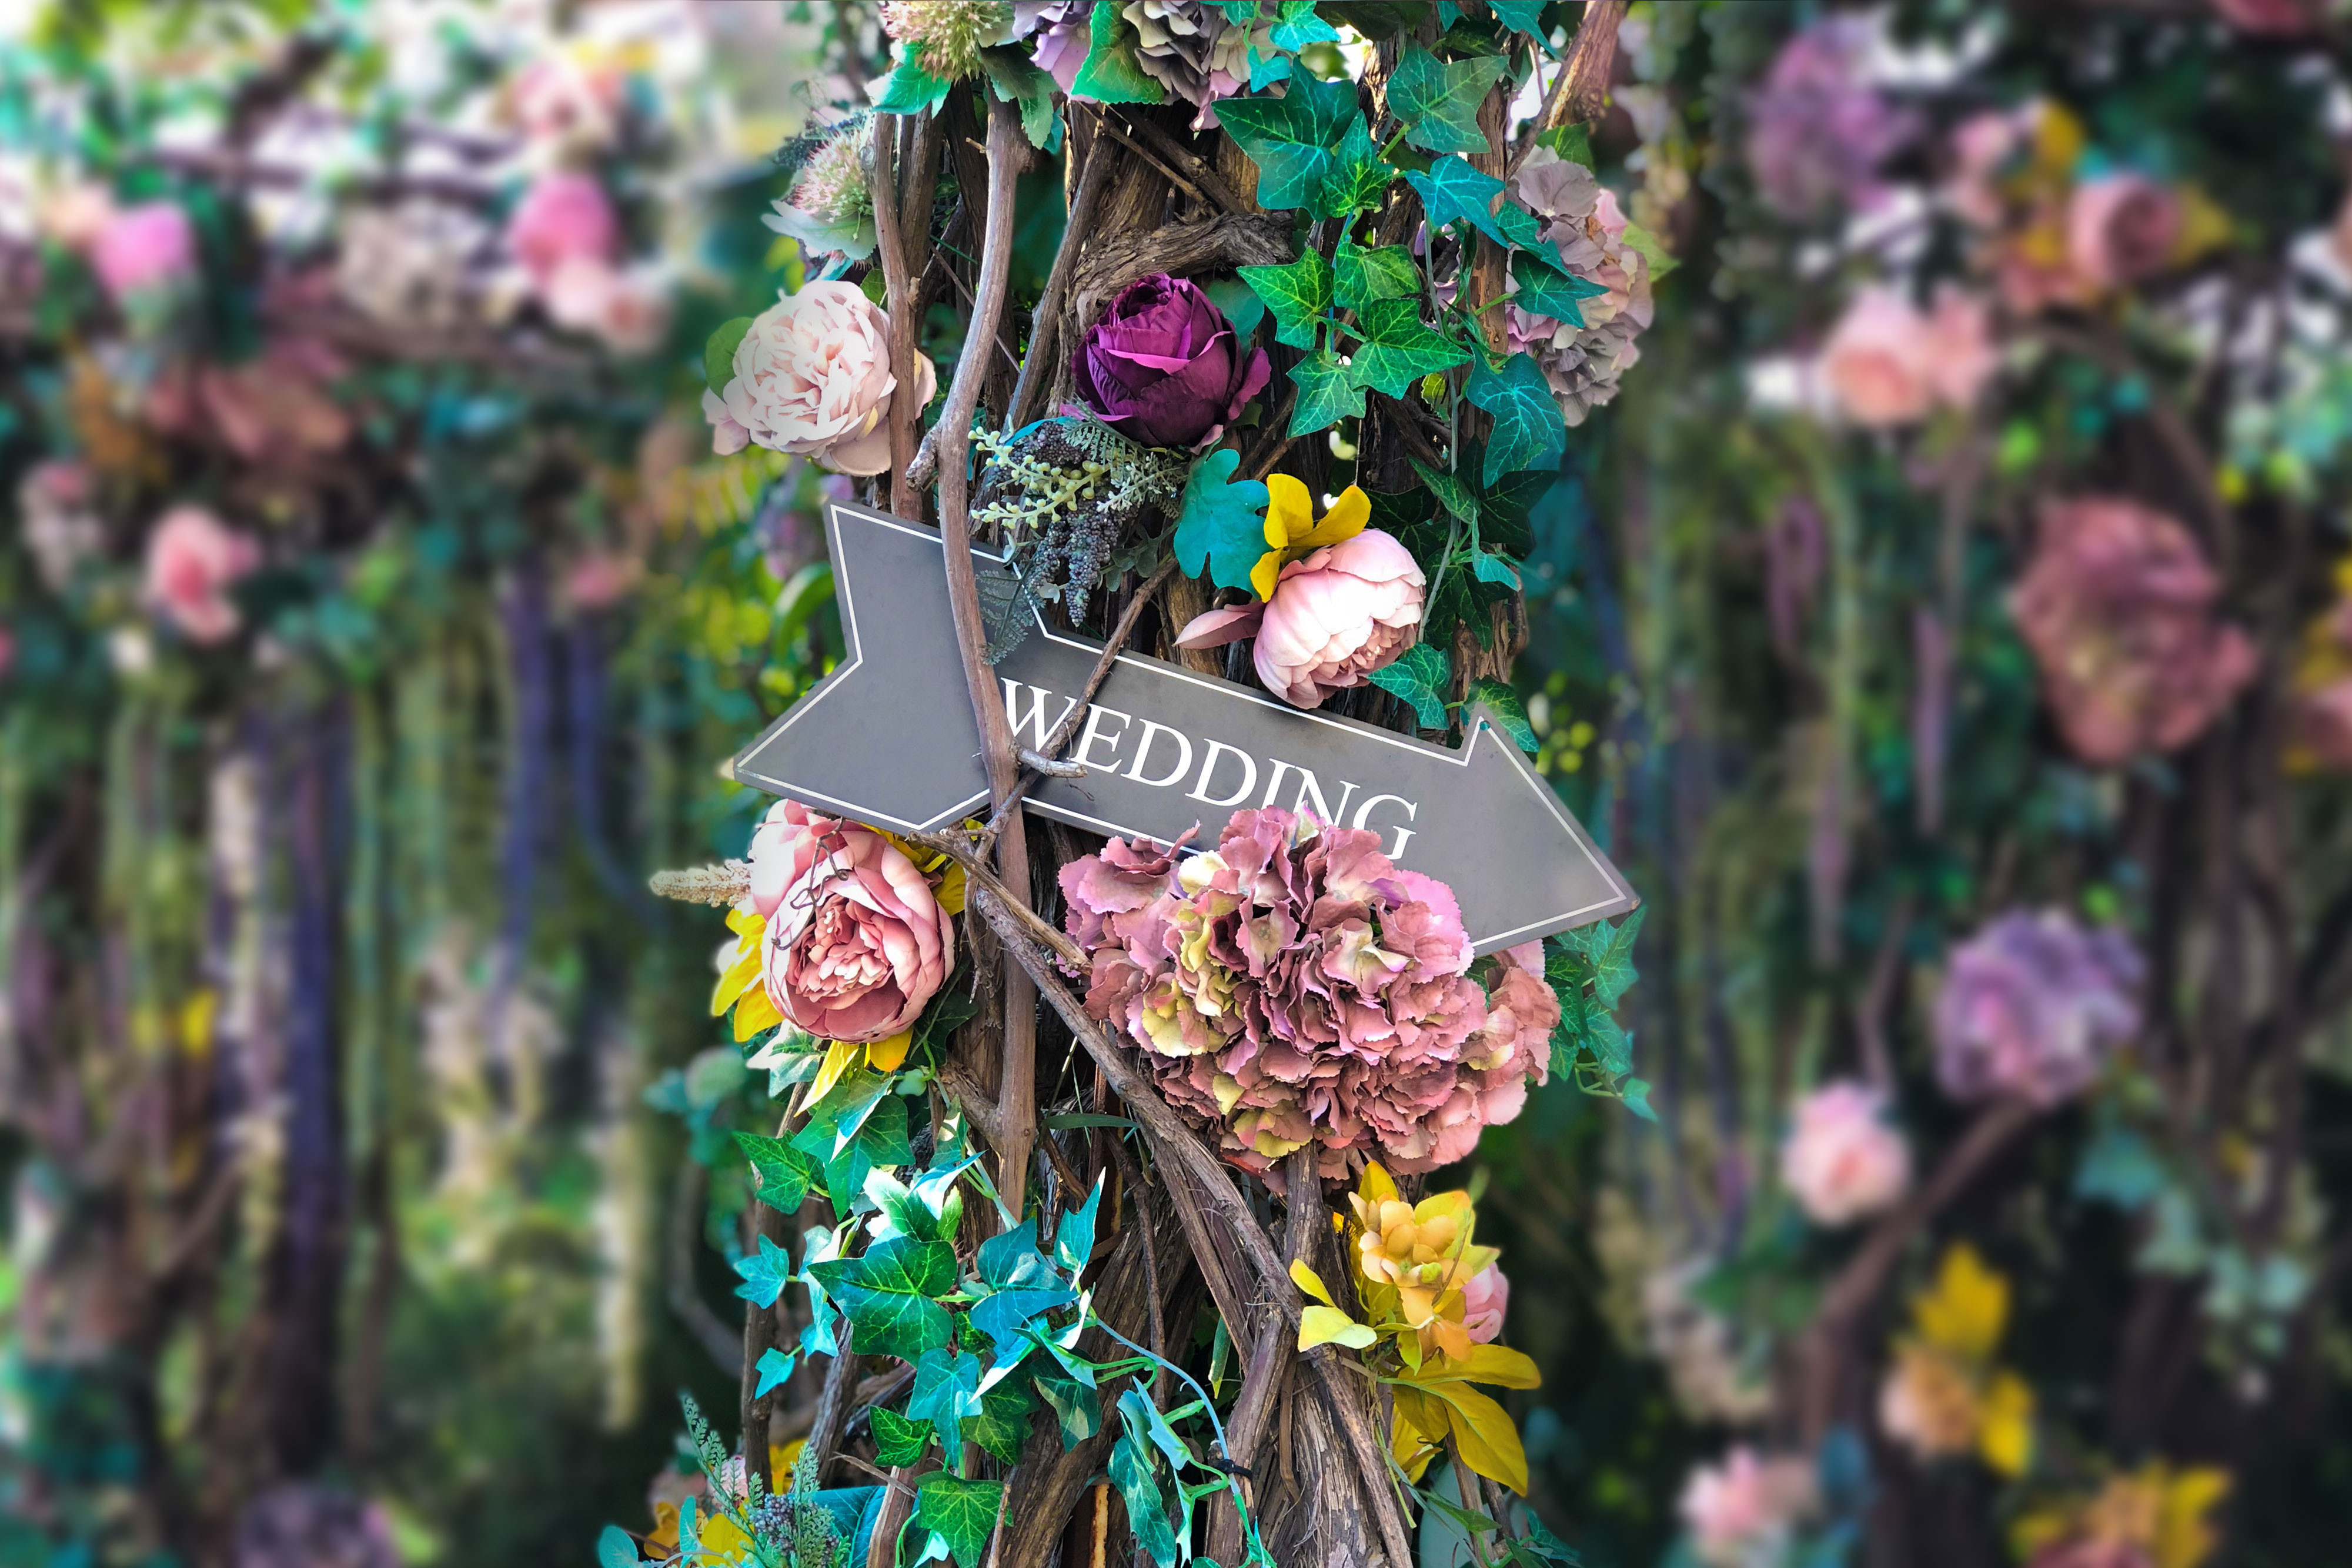 Smoky Mountain Wedding Reception Sites - Wedding Sign